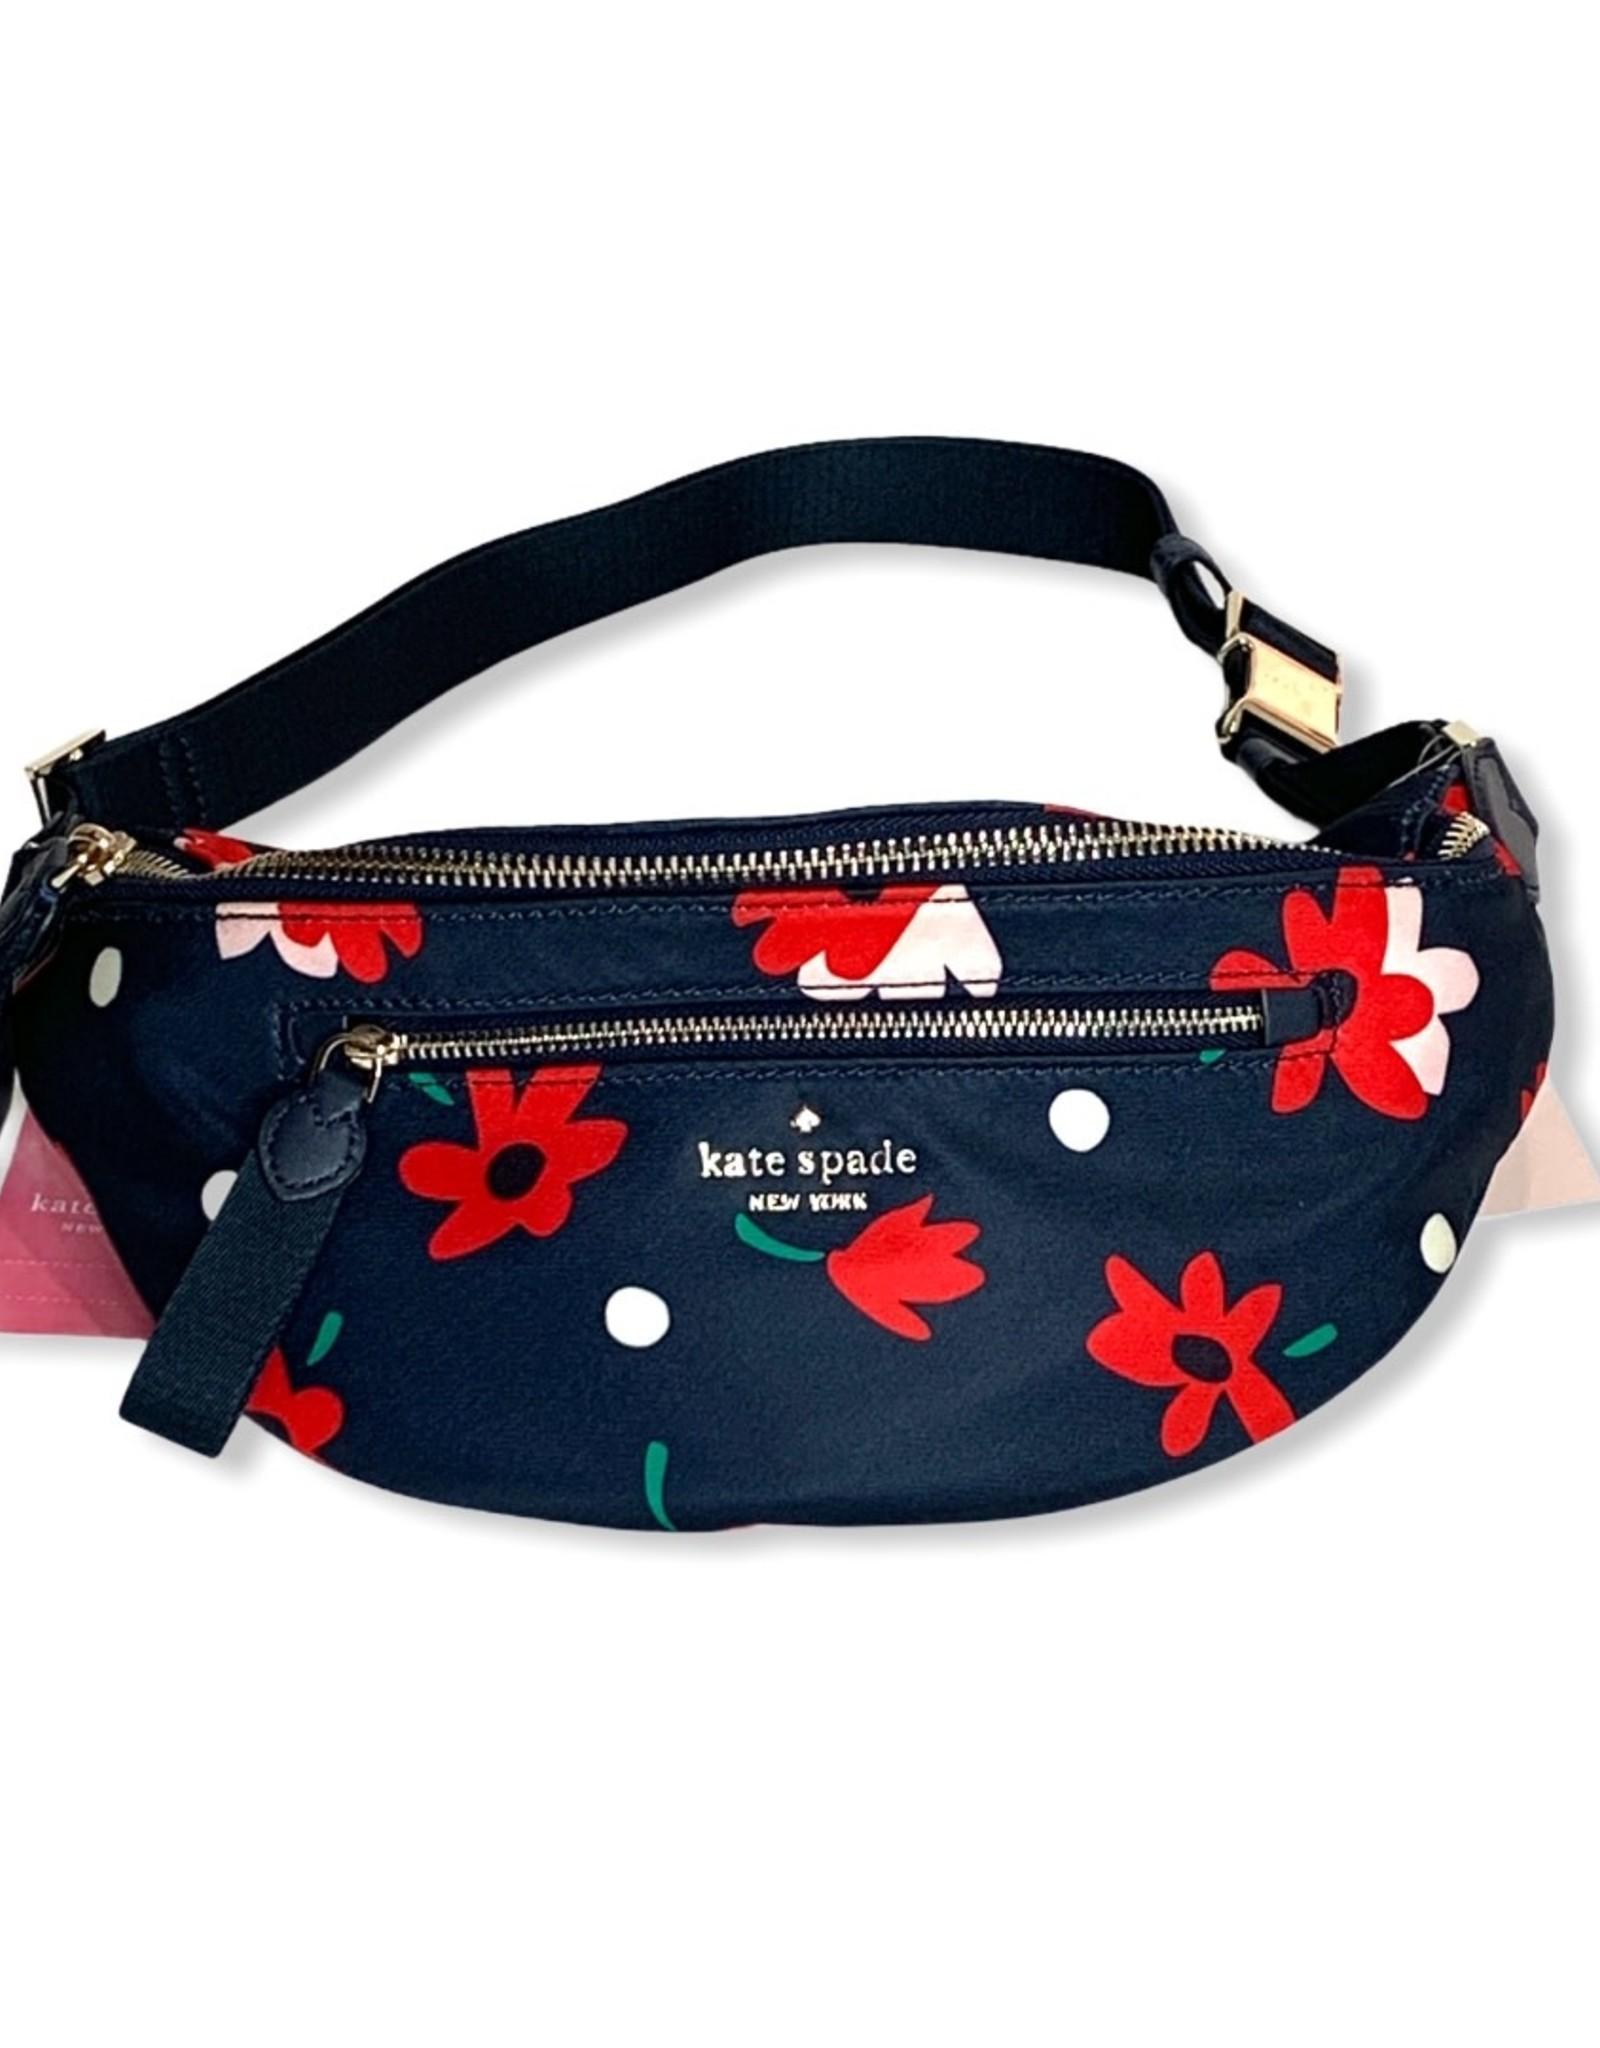 Kate Spade Kate Spade Chelsea Belt Bag